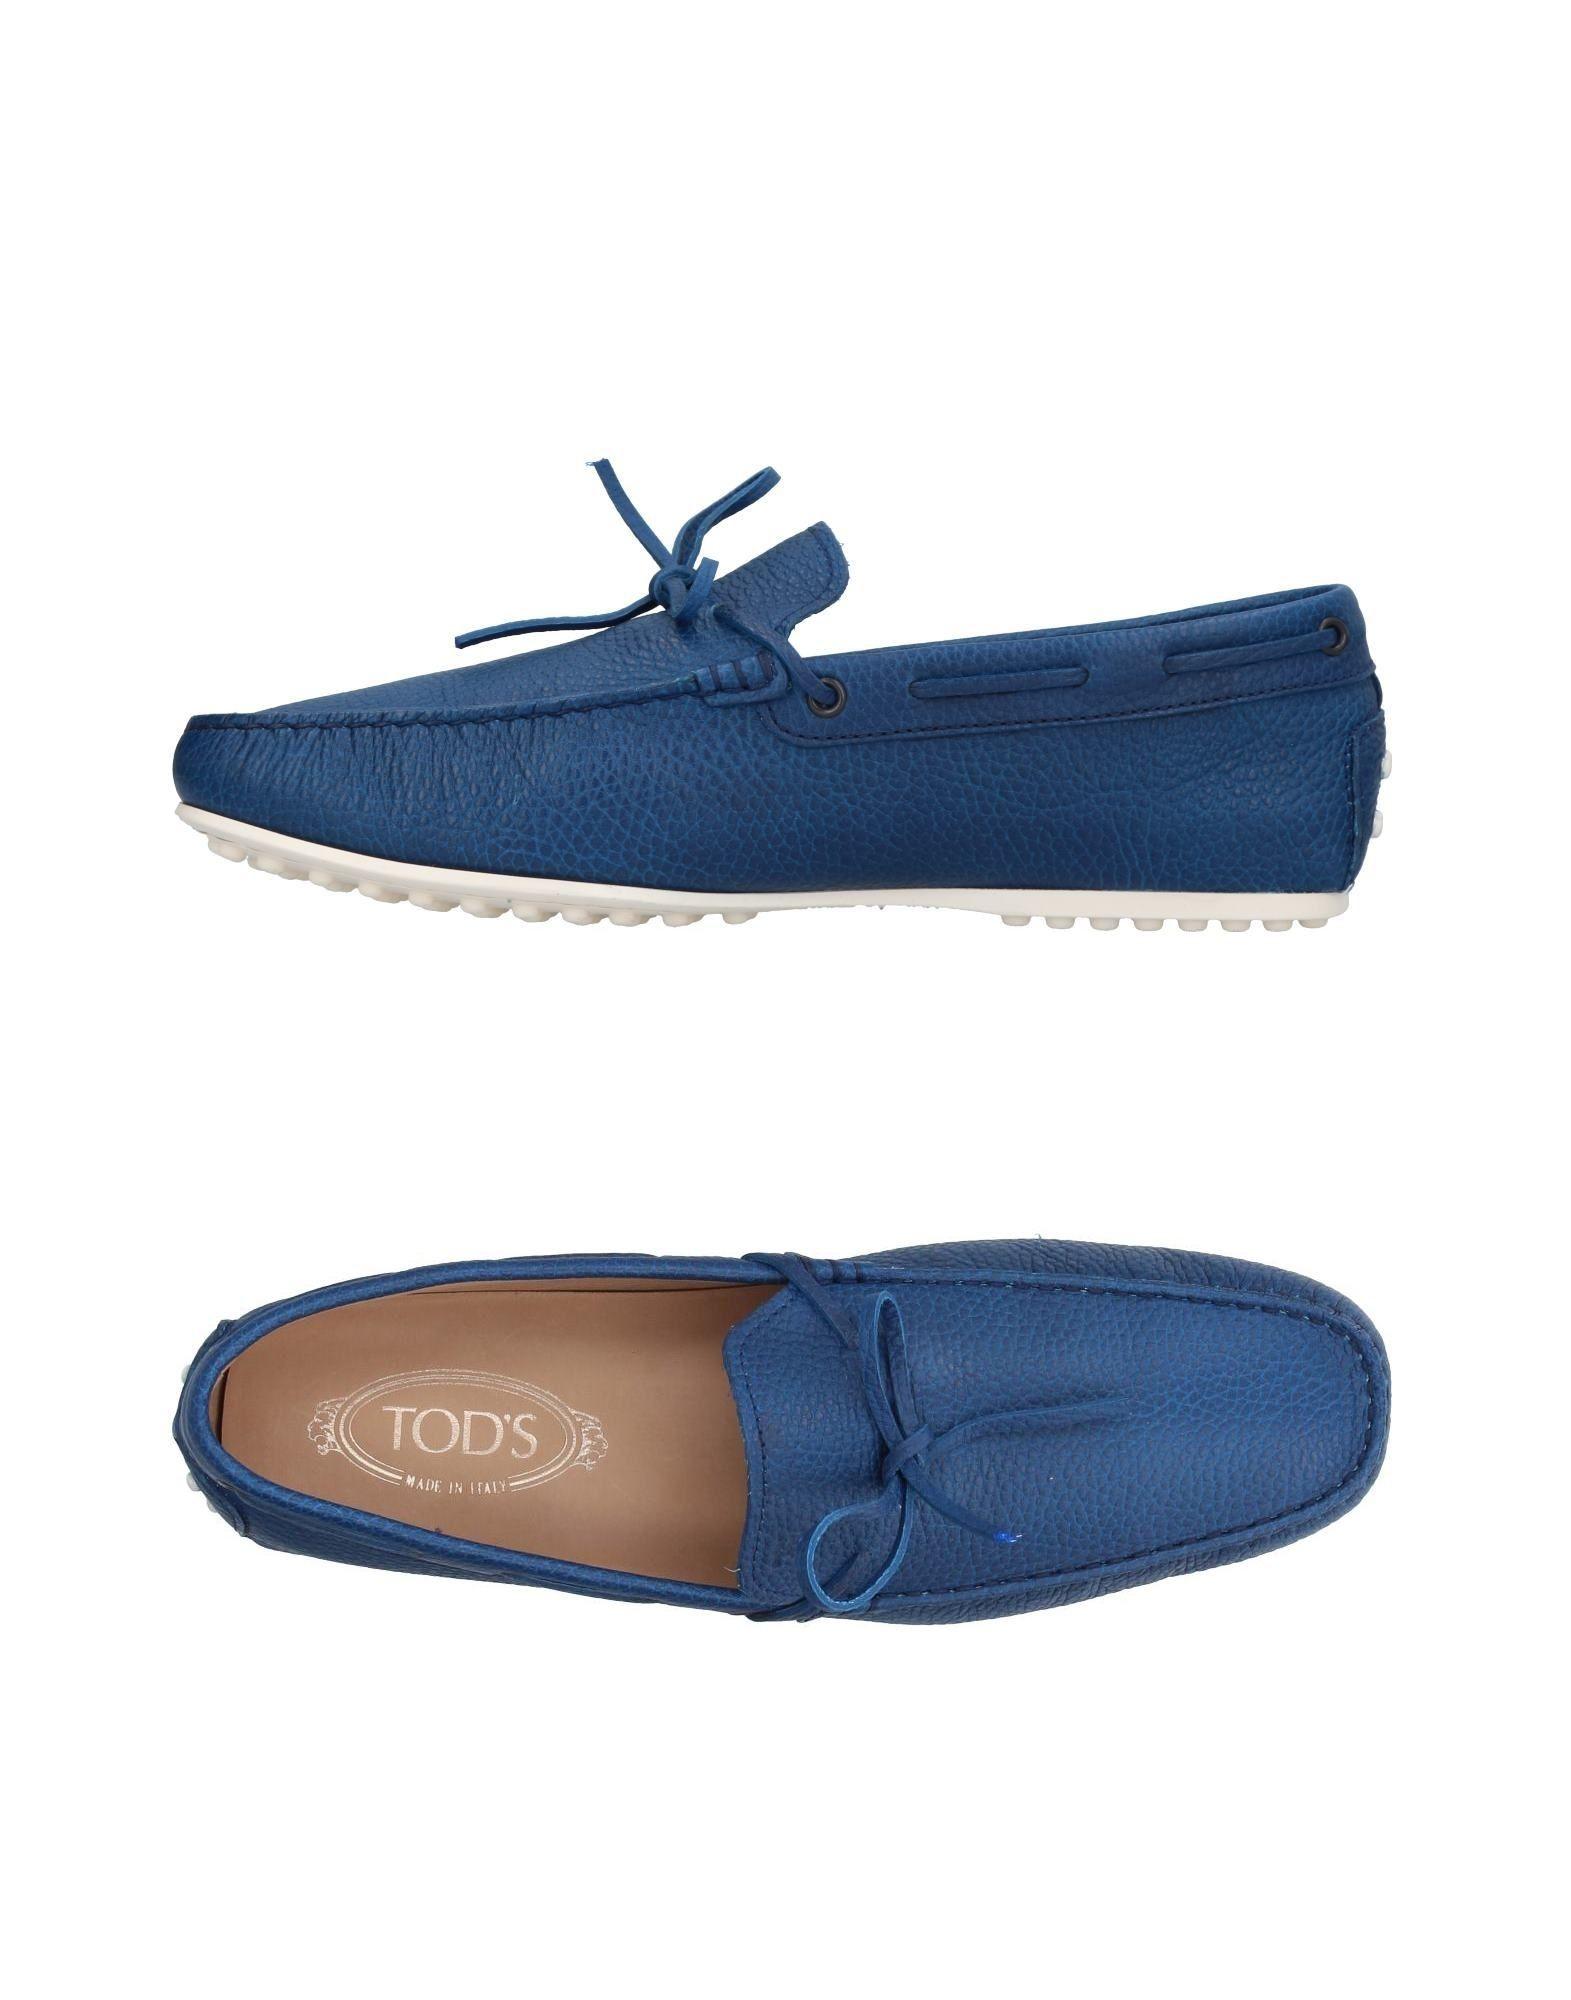 Tod's Mokassins Herren  11319299FX Gute Qualität beliebte Schuhe